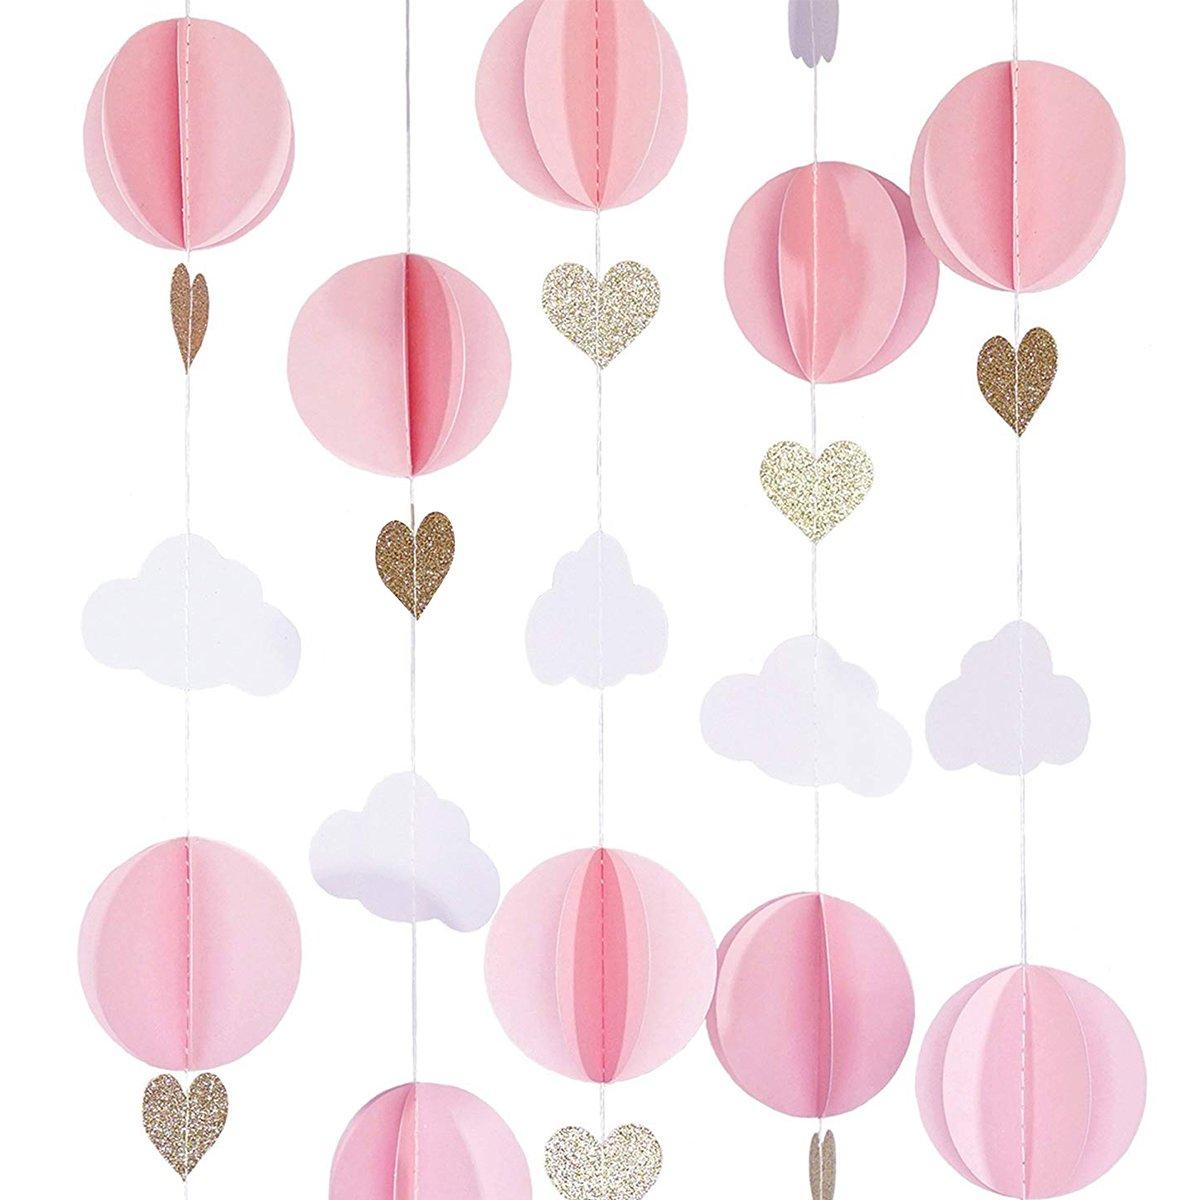 Cieovo パステルクラウド ホット エア バルーン ガーランド アップ アウェイ フォトプロップ テーマ 誕生日 ベビーシャワー 結婚式 装飾に最適 (カラー) air balloon pastel01  A-pink B07FNG238V